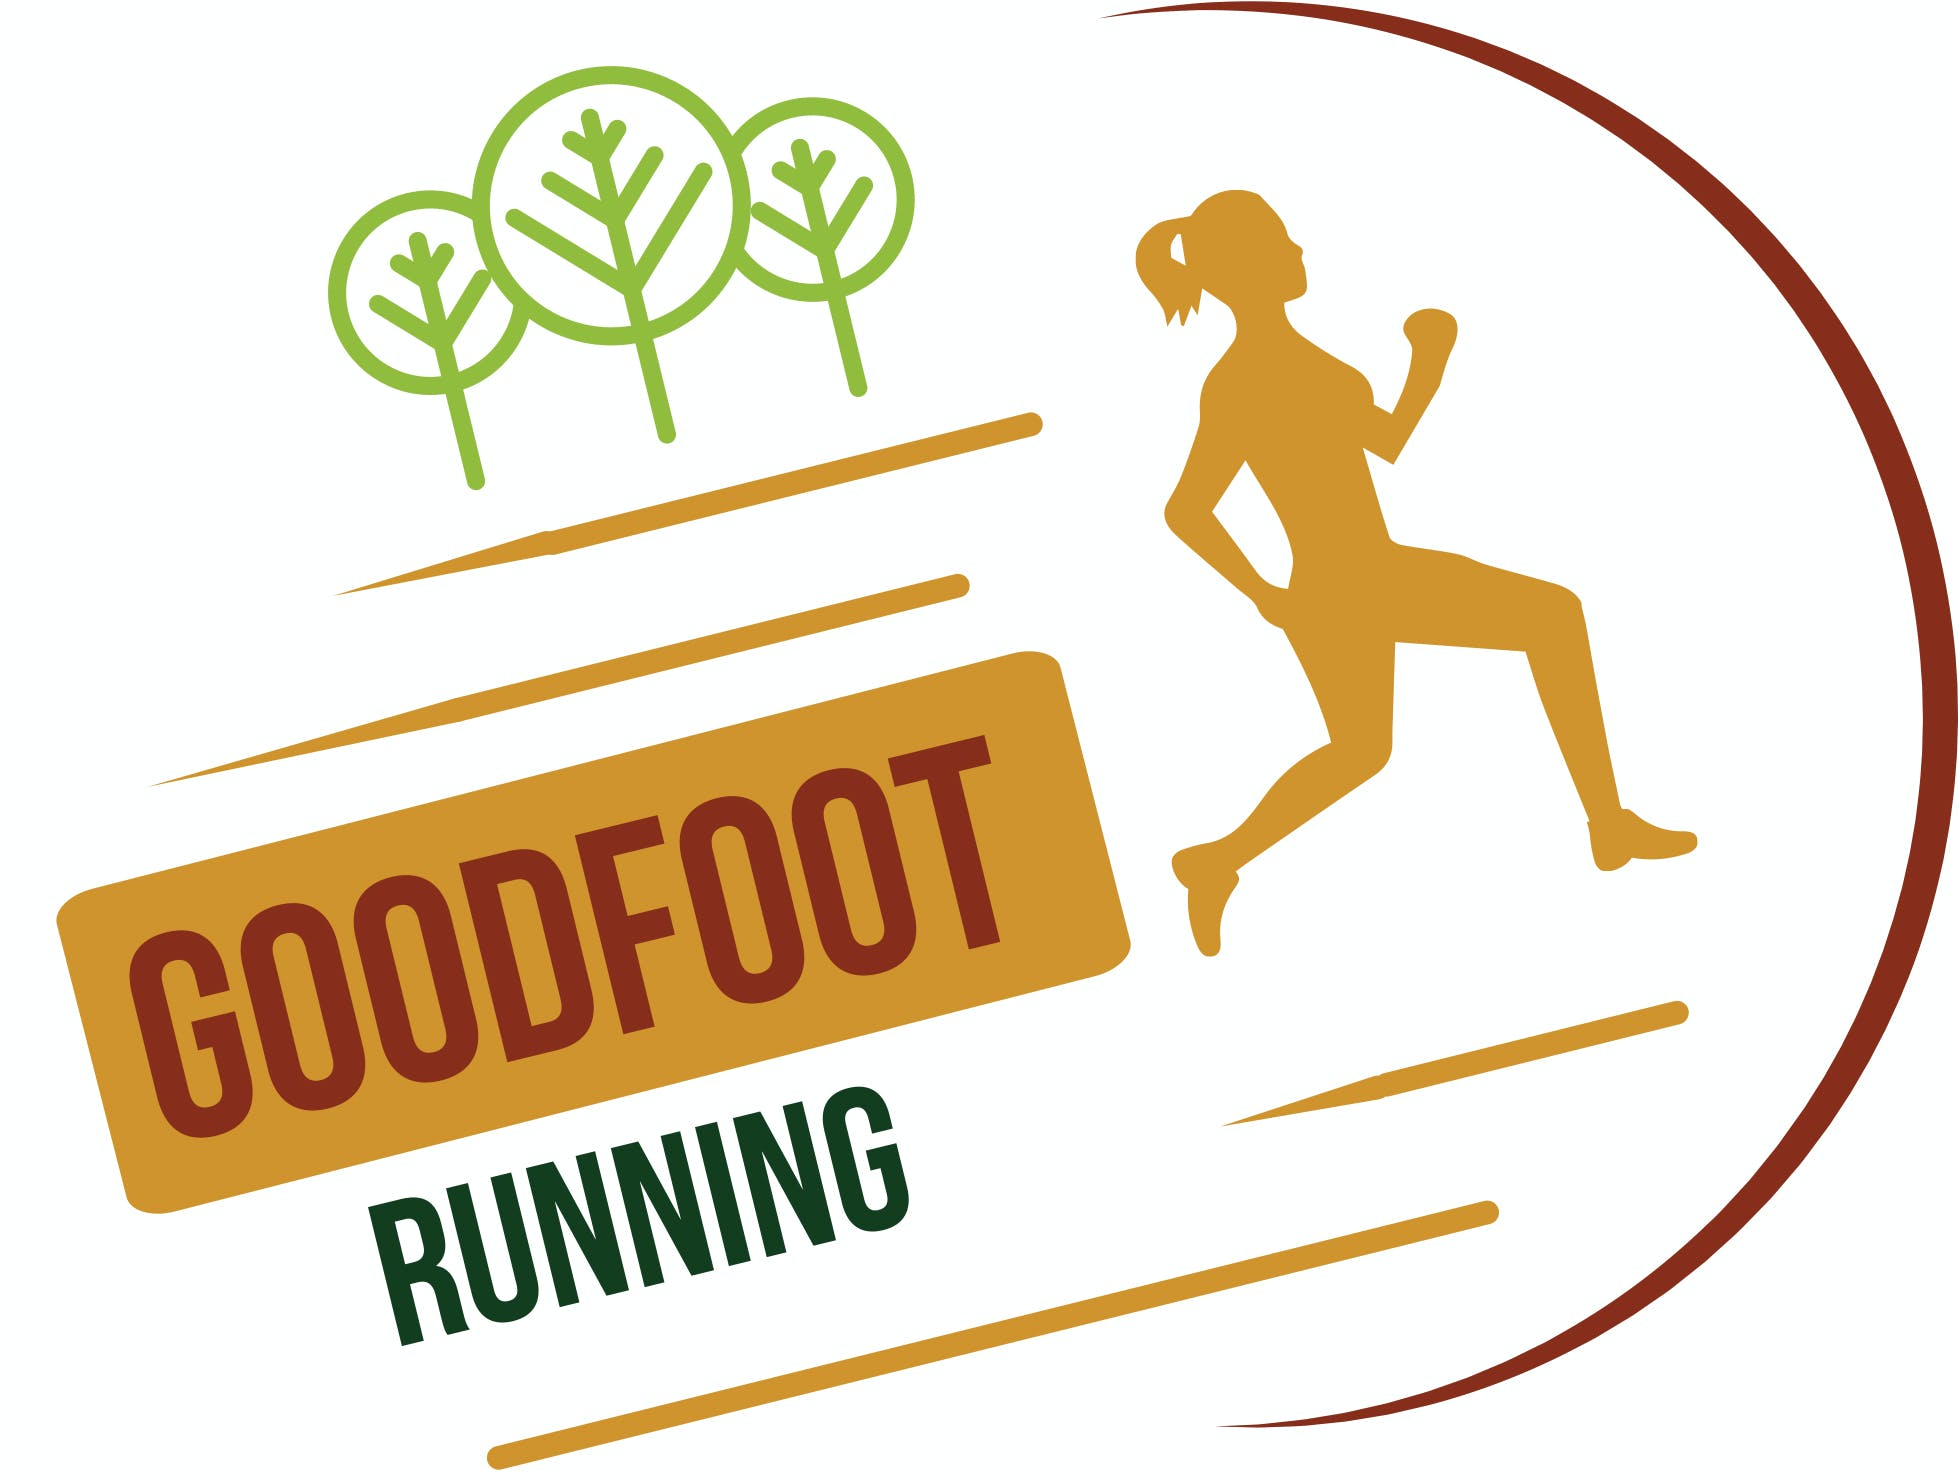 GoodFoot logo